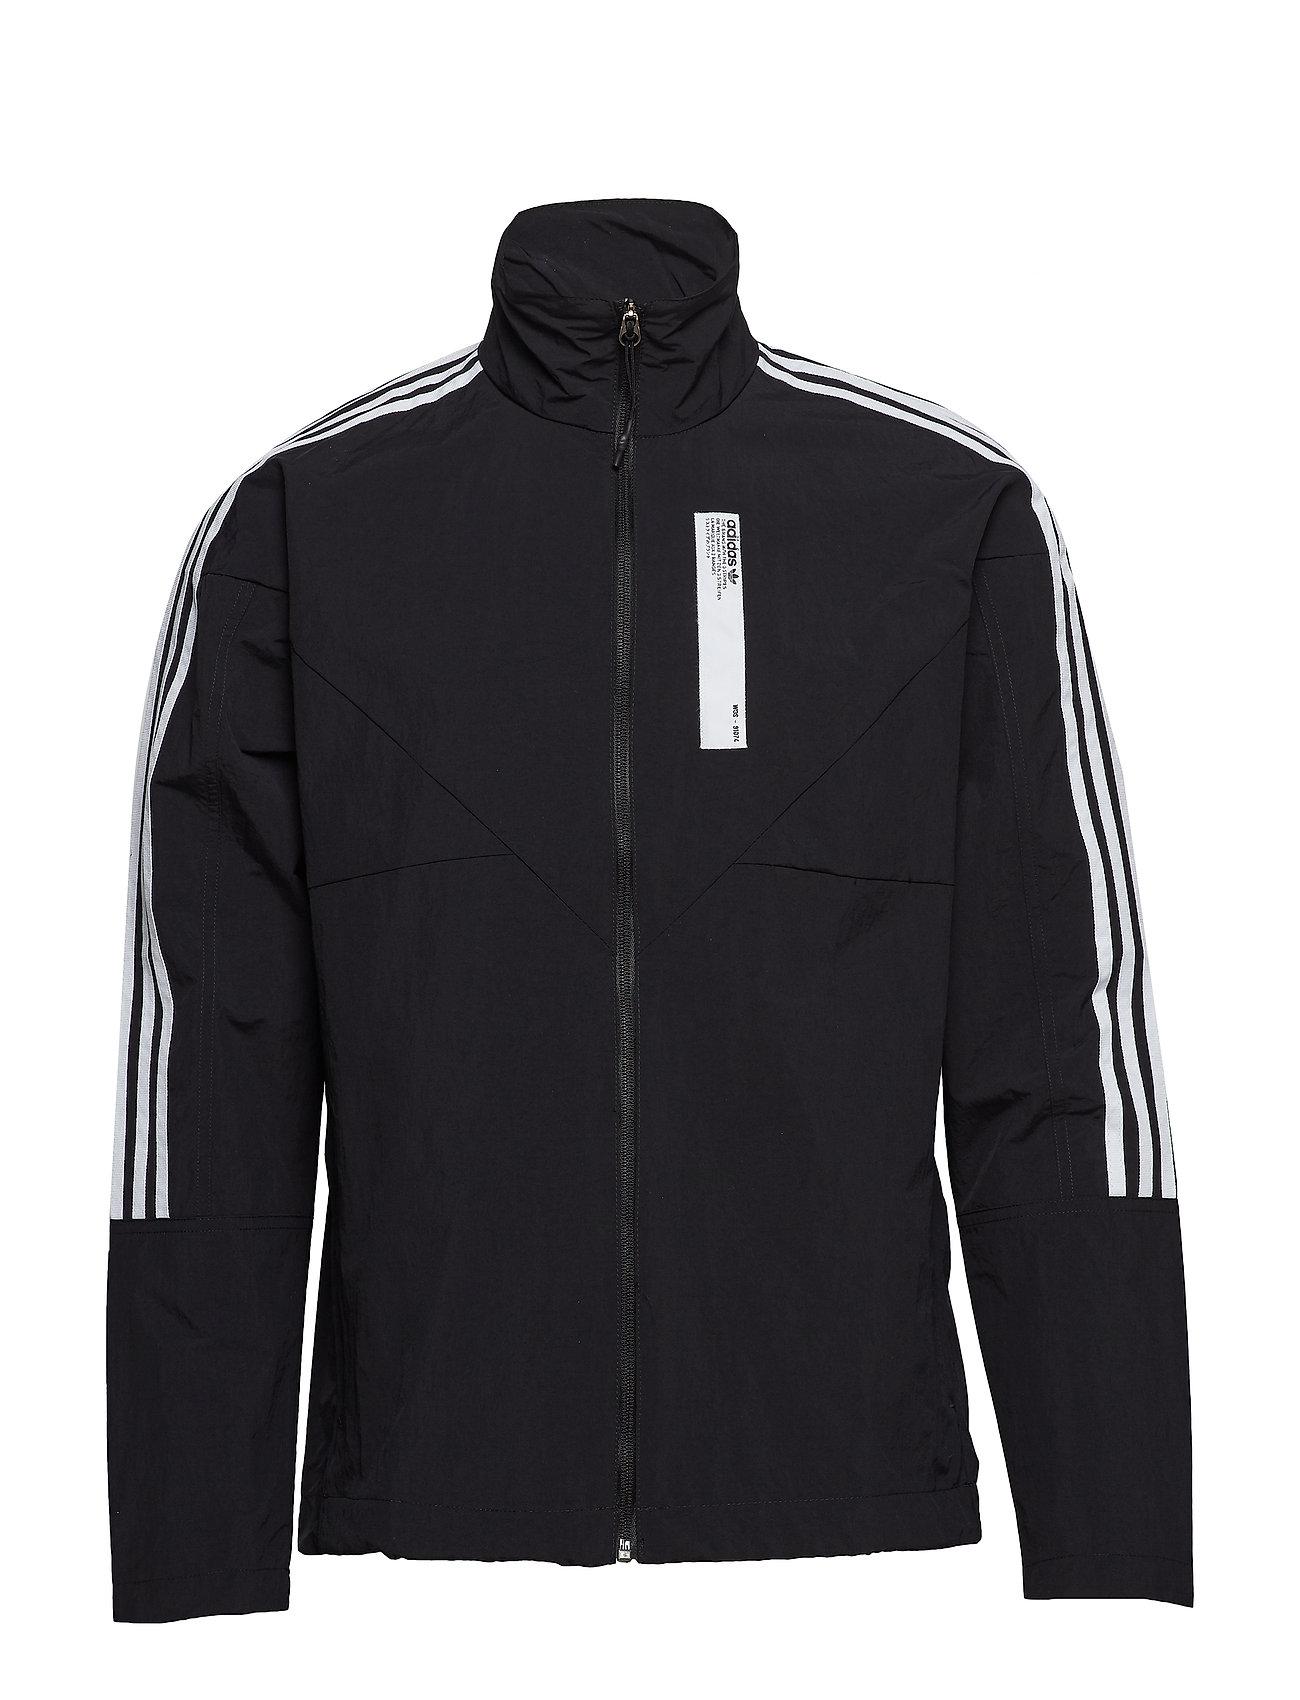 jacket adidas Originals NMD Track Top Black men´s